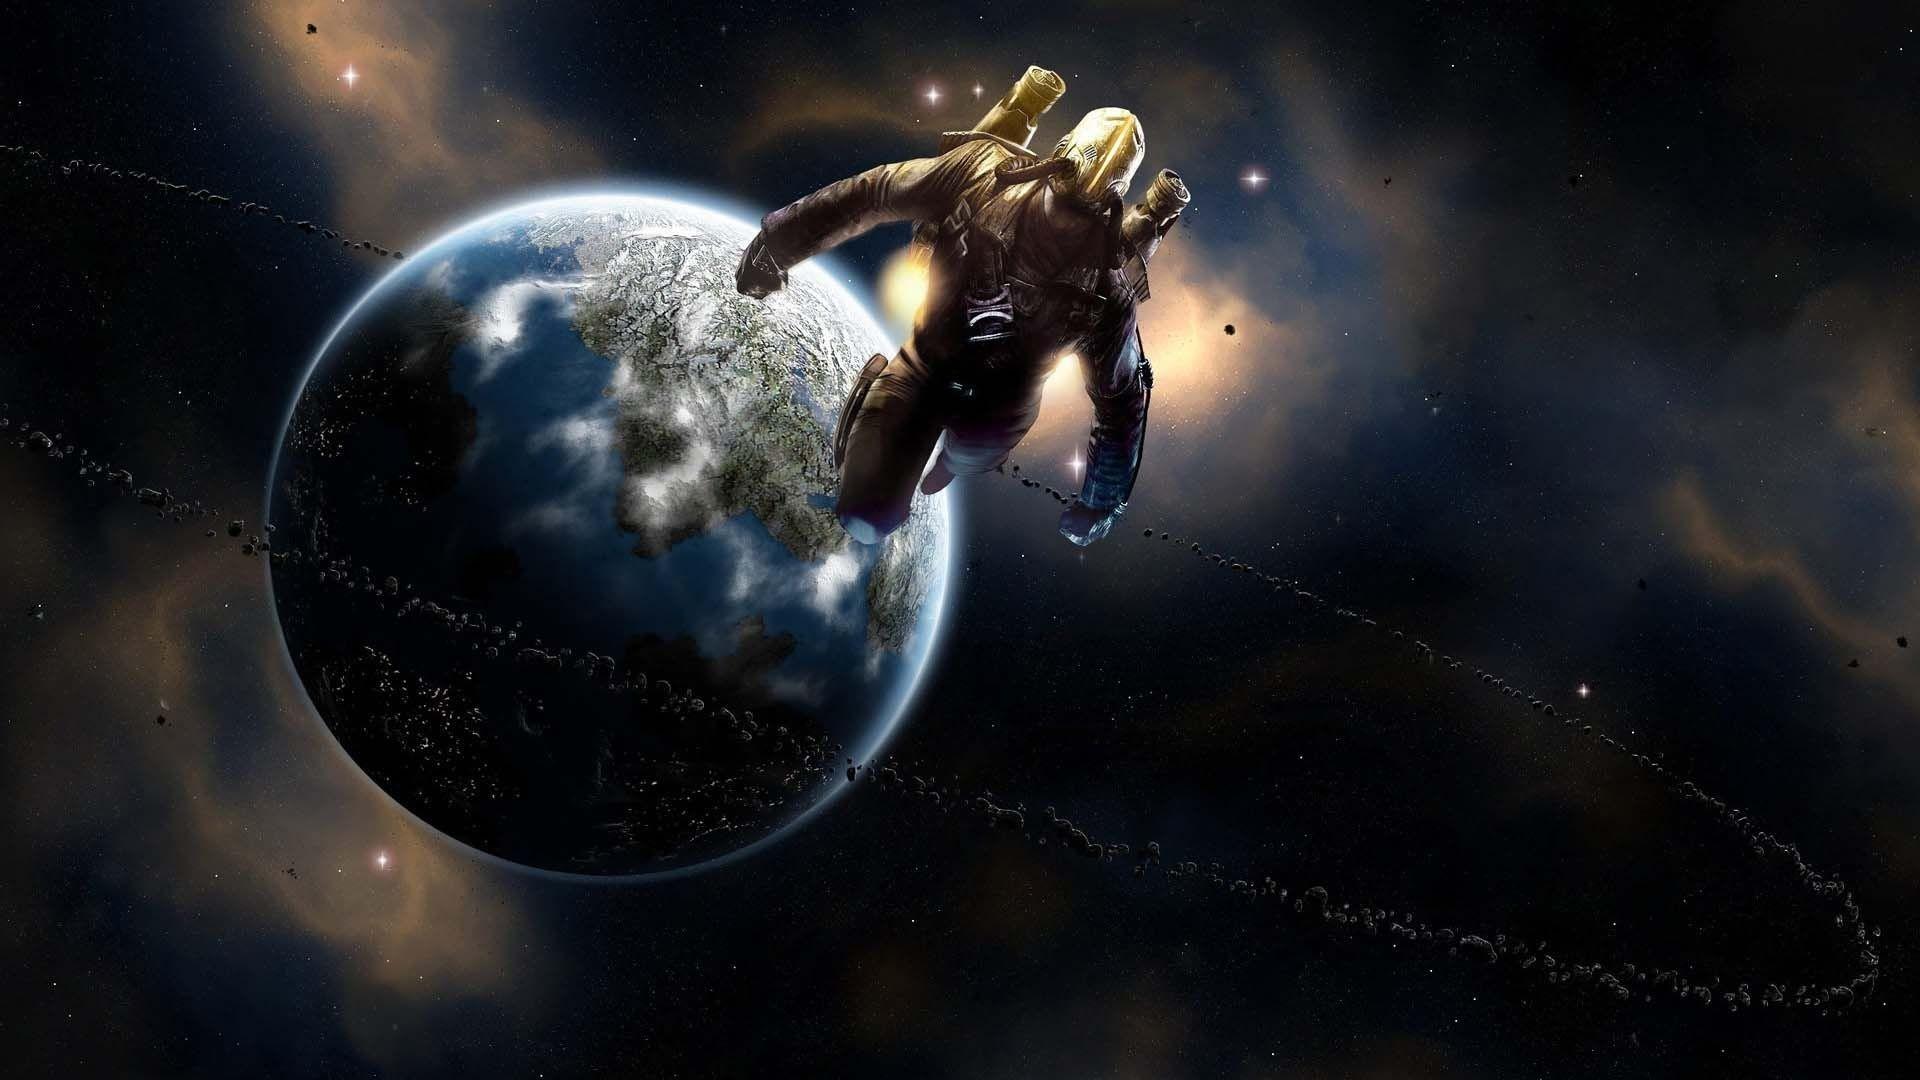 Spaceman In Universe   HD Digital Universe Wallpaper Free Download …